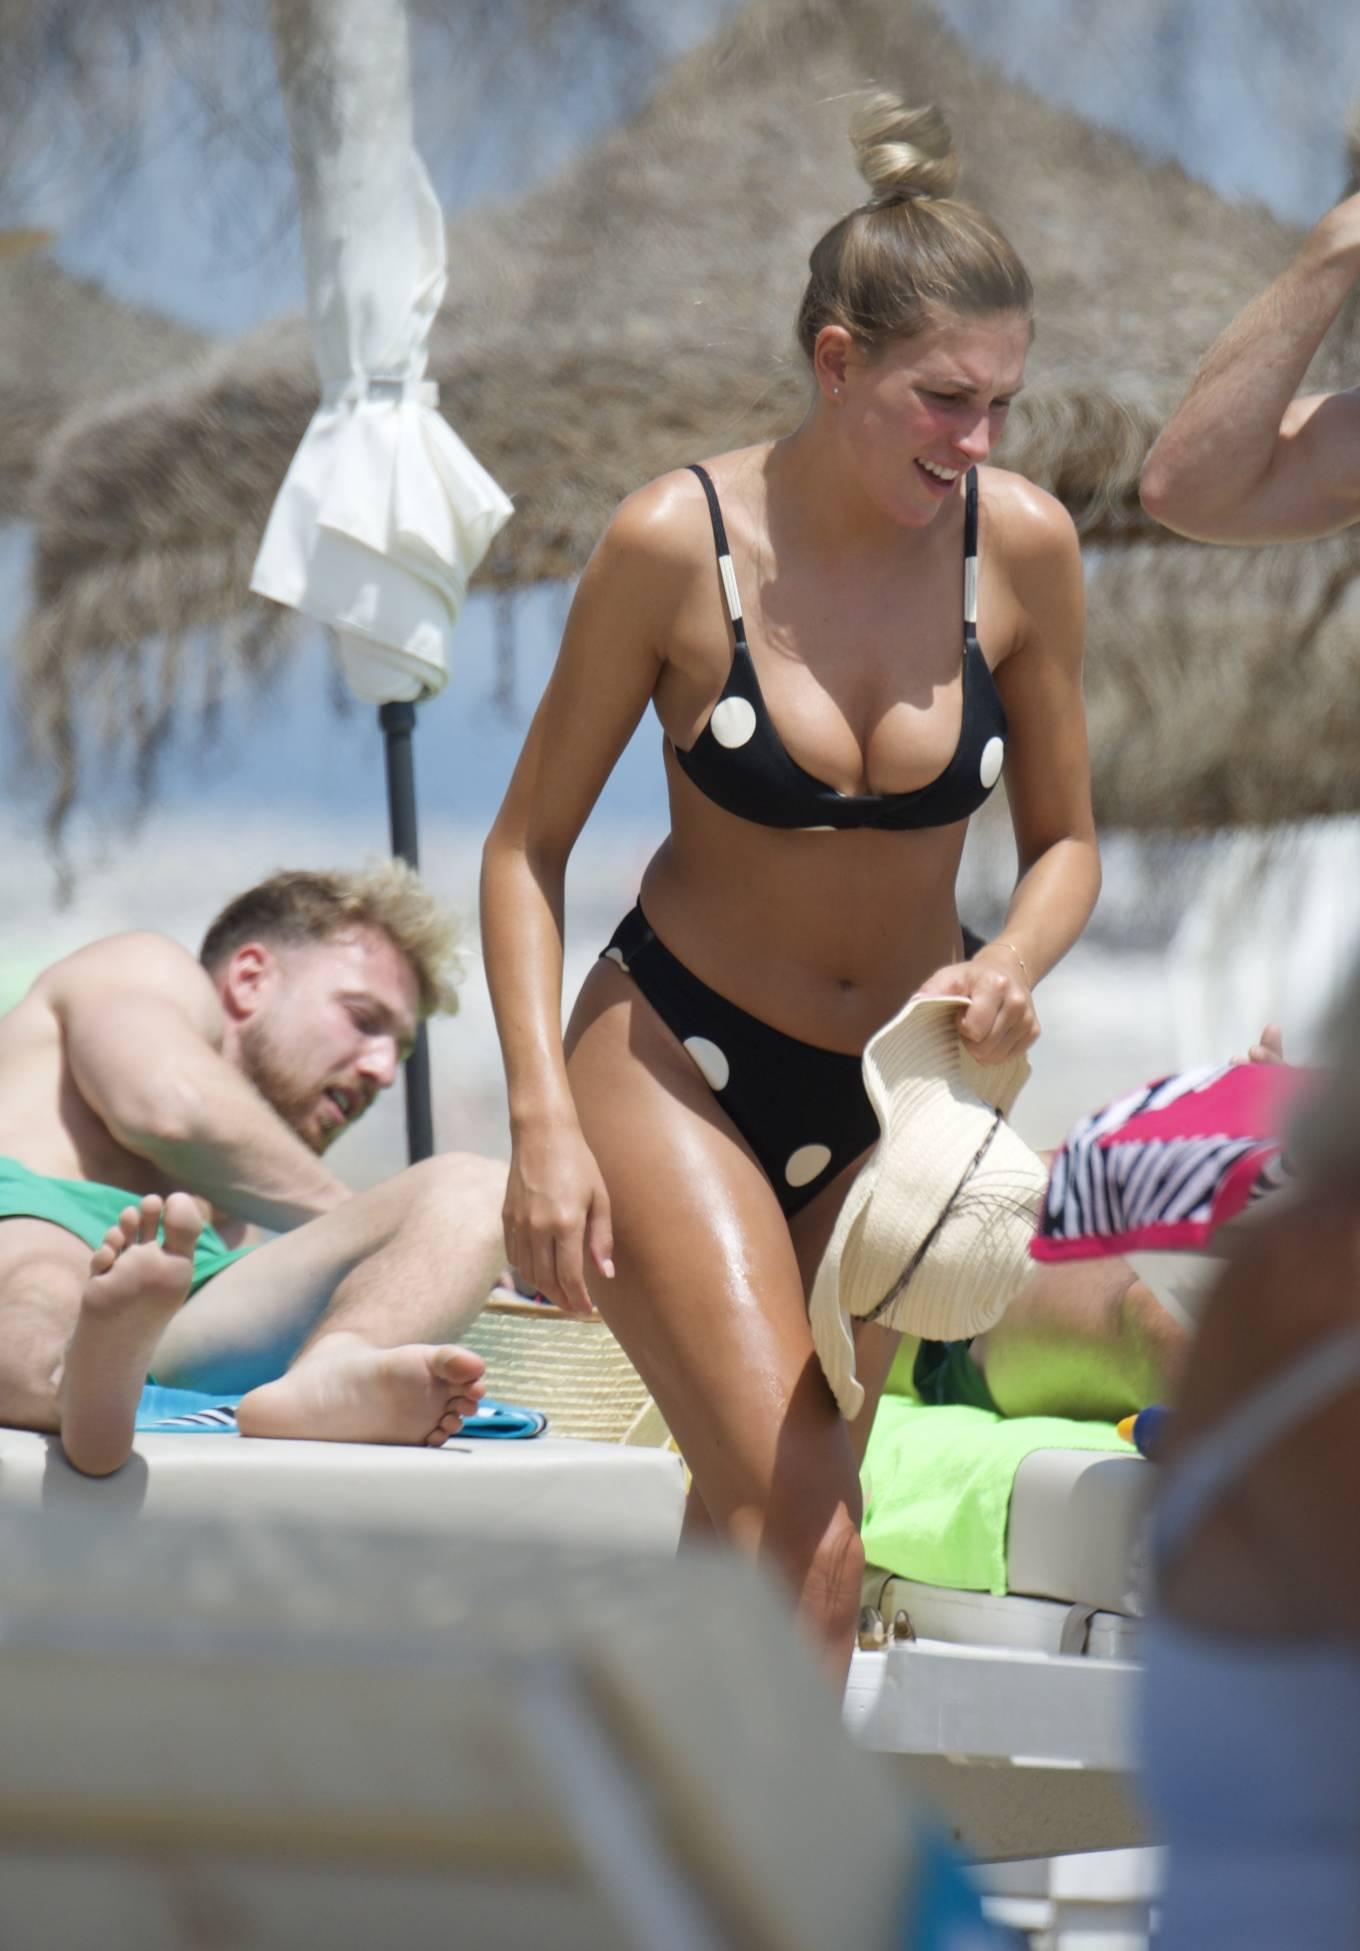 Zara McDermott 2020 : Zara McDermott in Bikini 2020-14